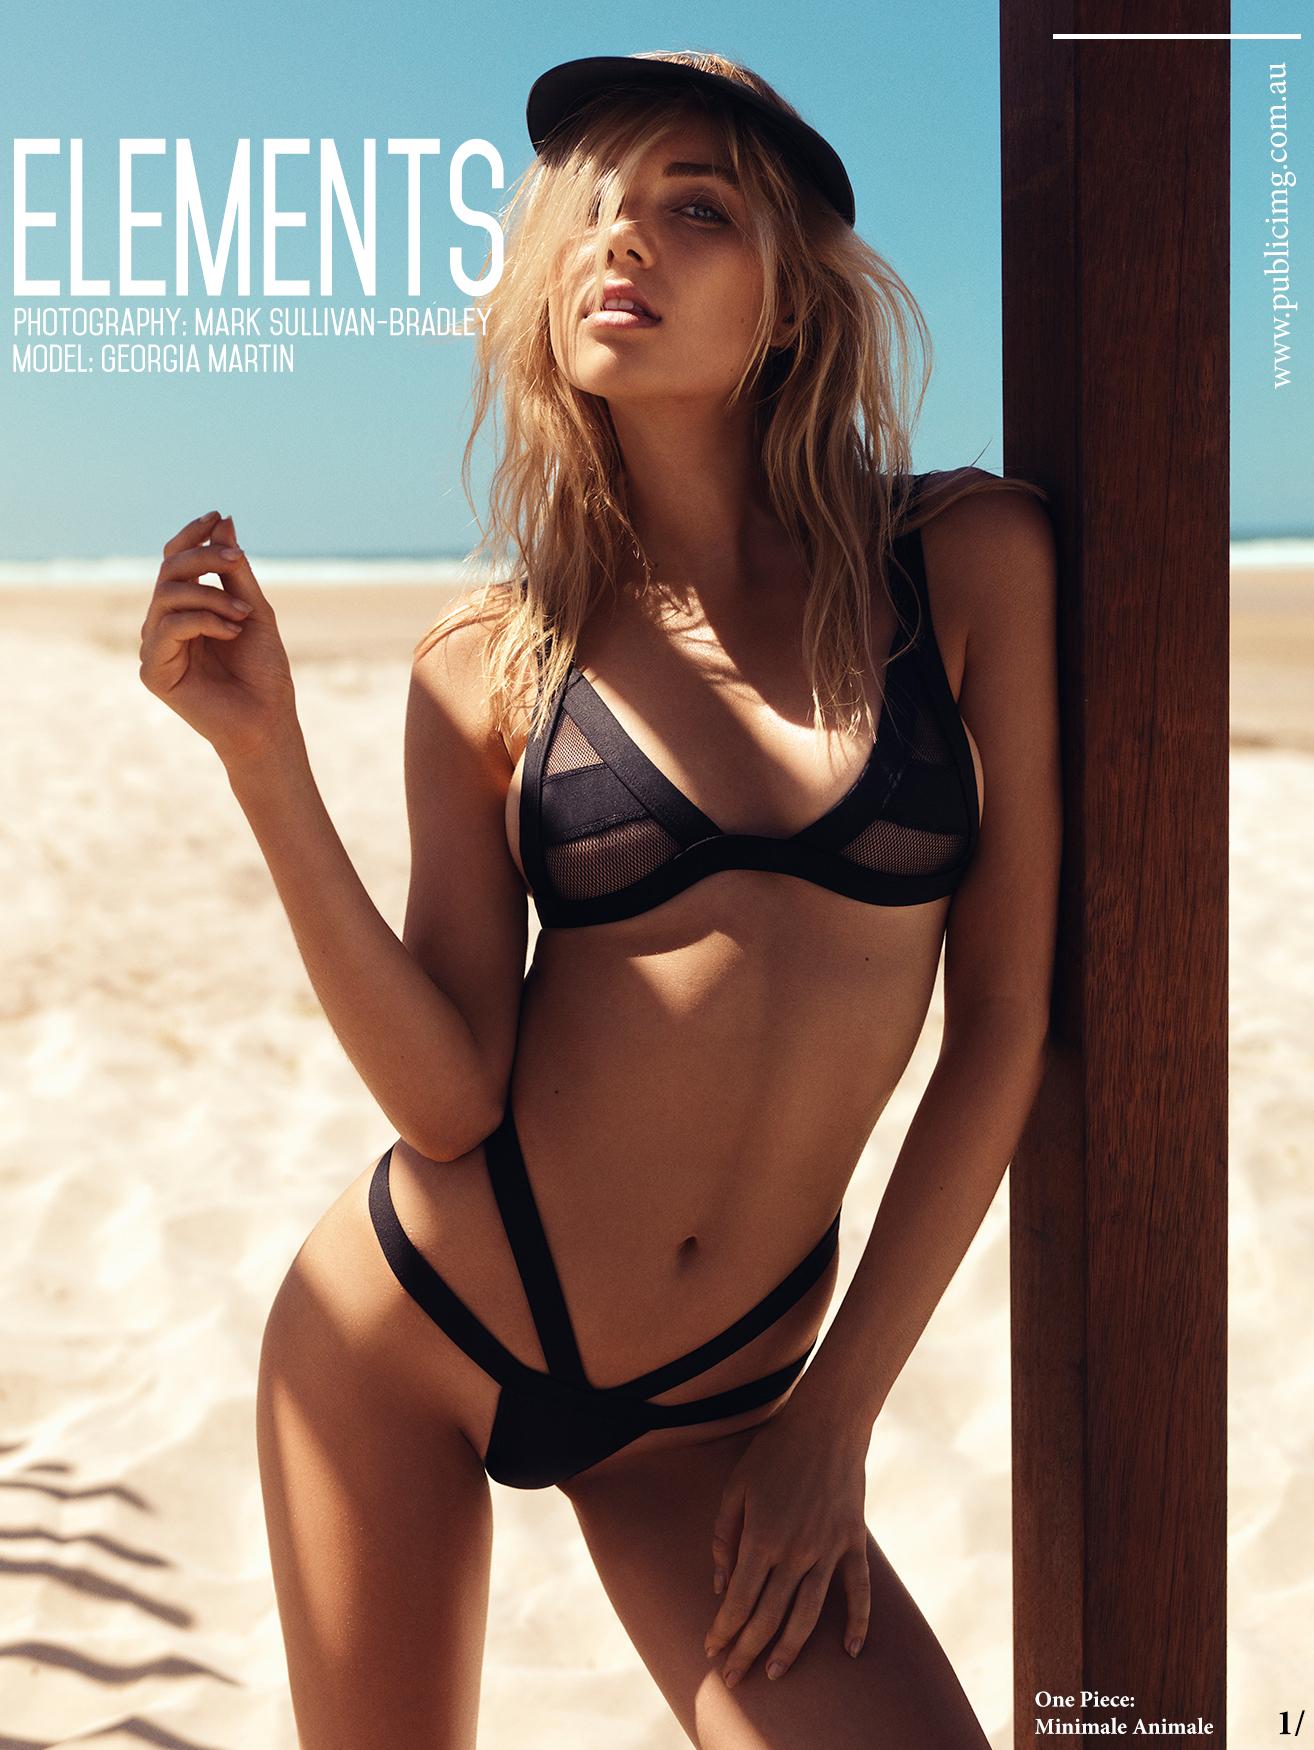 SUMMERSITE     Model - Georgia Martin / Stylist - Marisa Sidoti / HMUA - Satya Schmitz    Location - Belongil Beach, Byron Bay. NSW